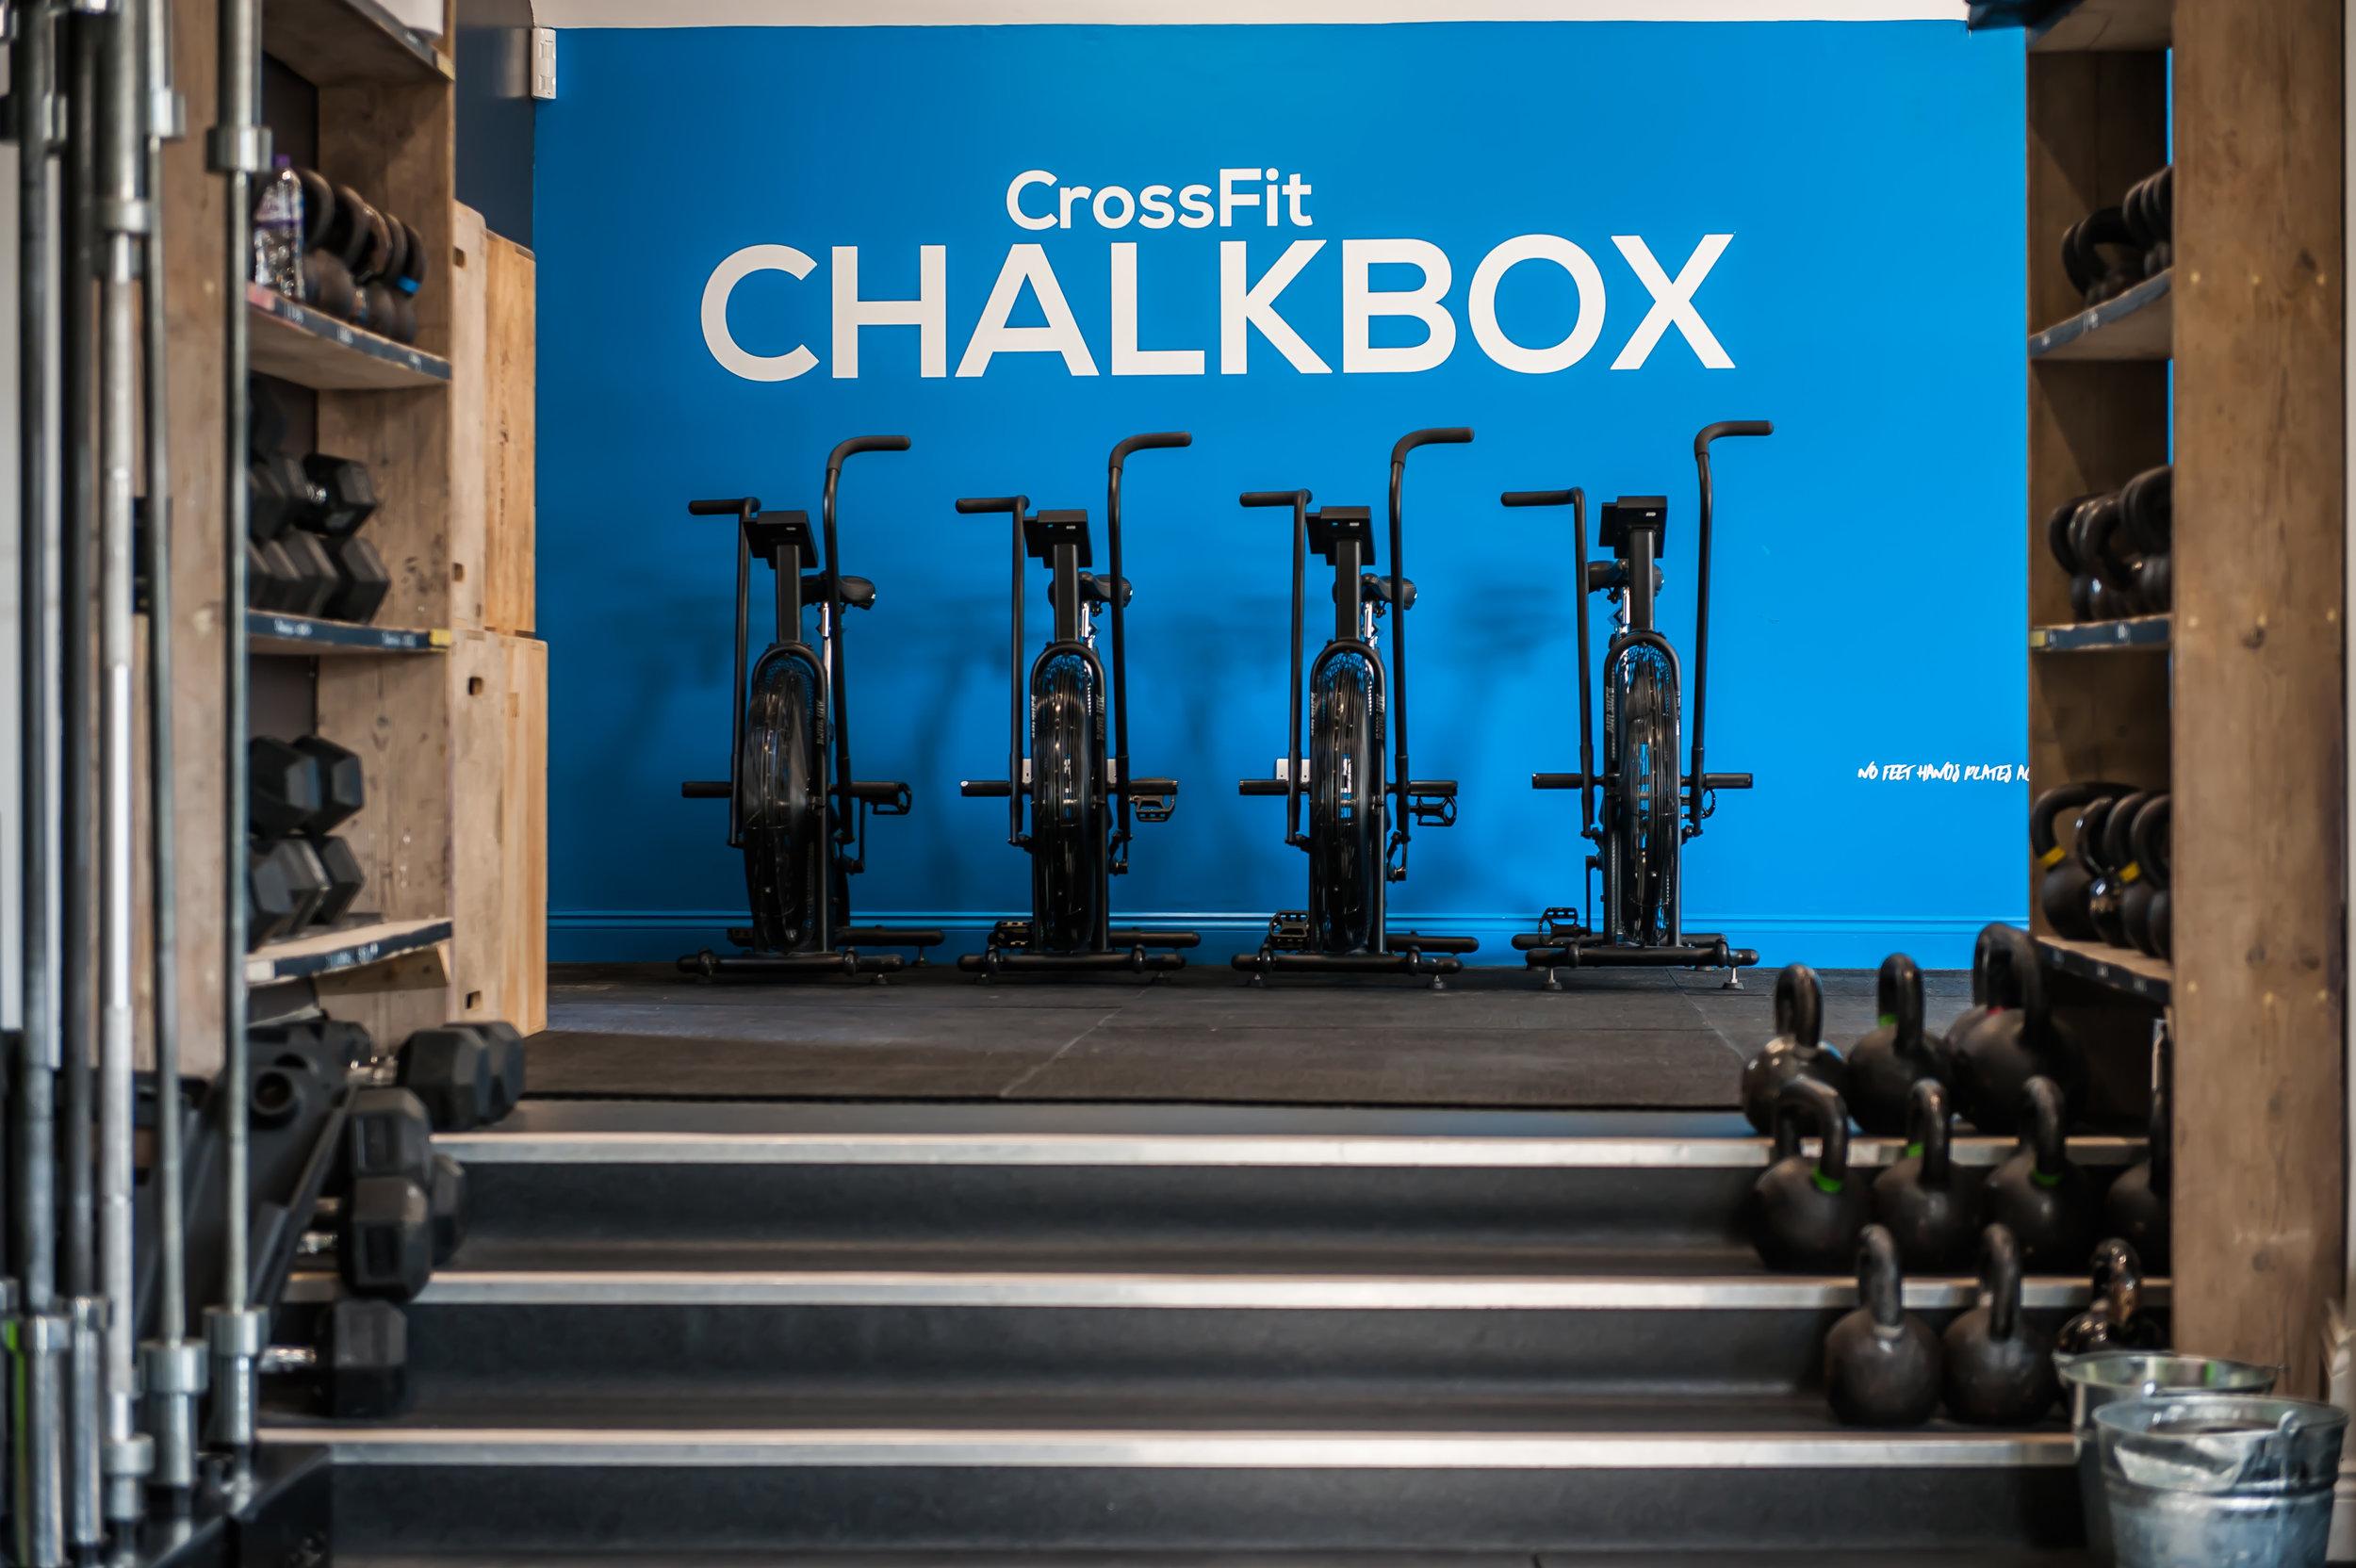 Top of the range gym in Sevenoaks, Borough Green, Kent.